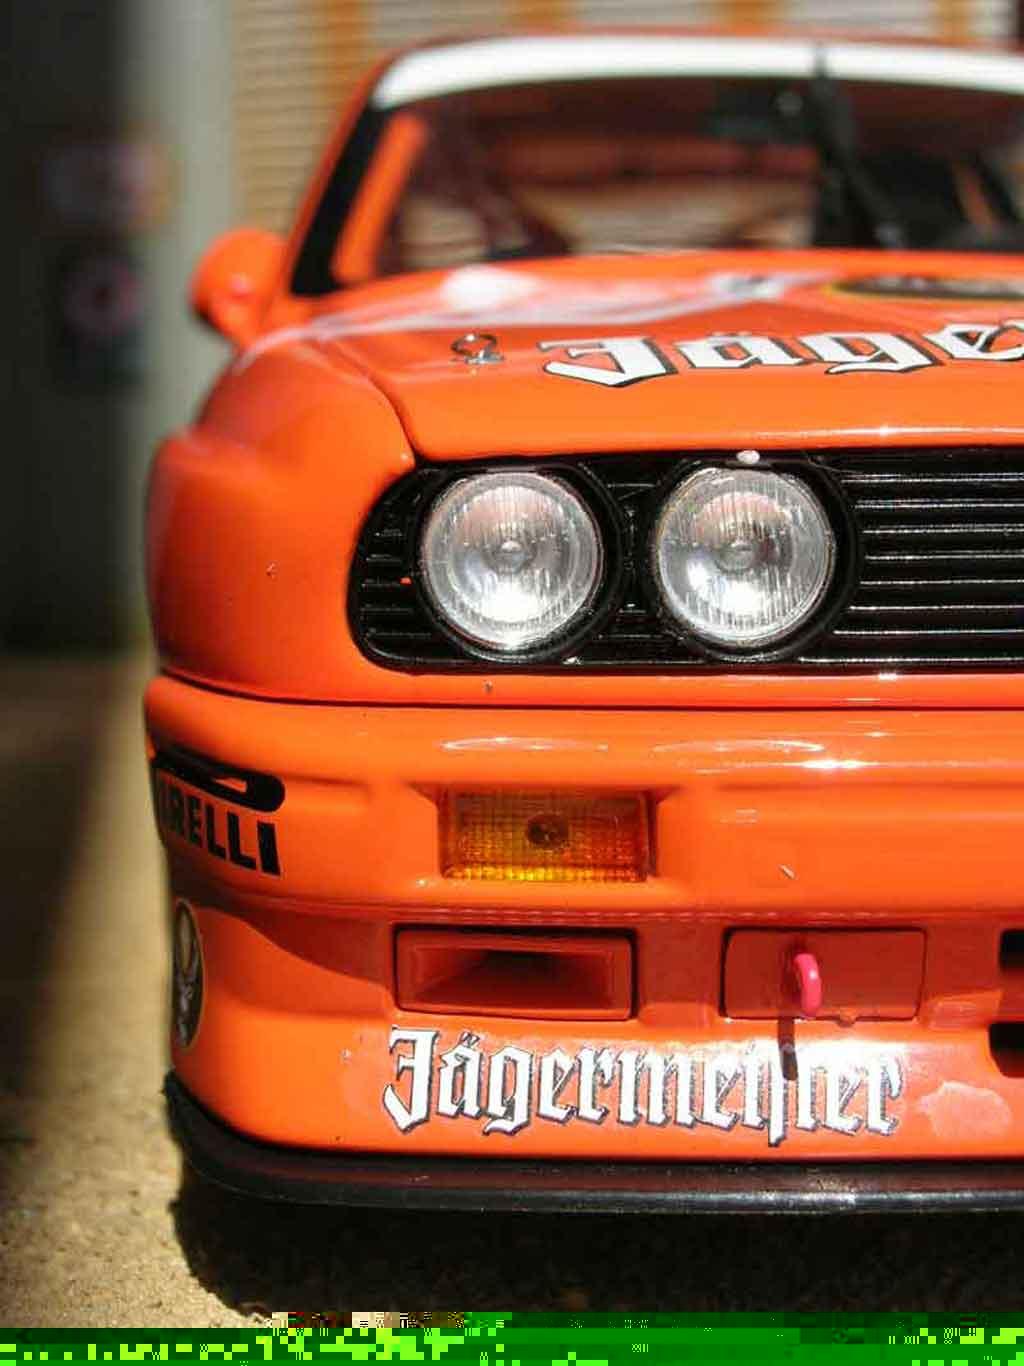 Bmw M3 E30 1/18 Minichamps DTM team linder #18 hahne jagermeister